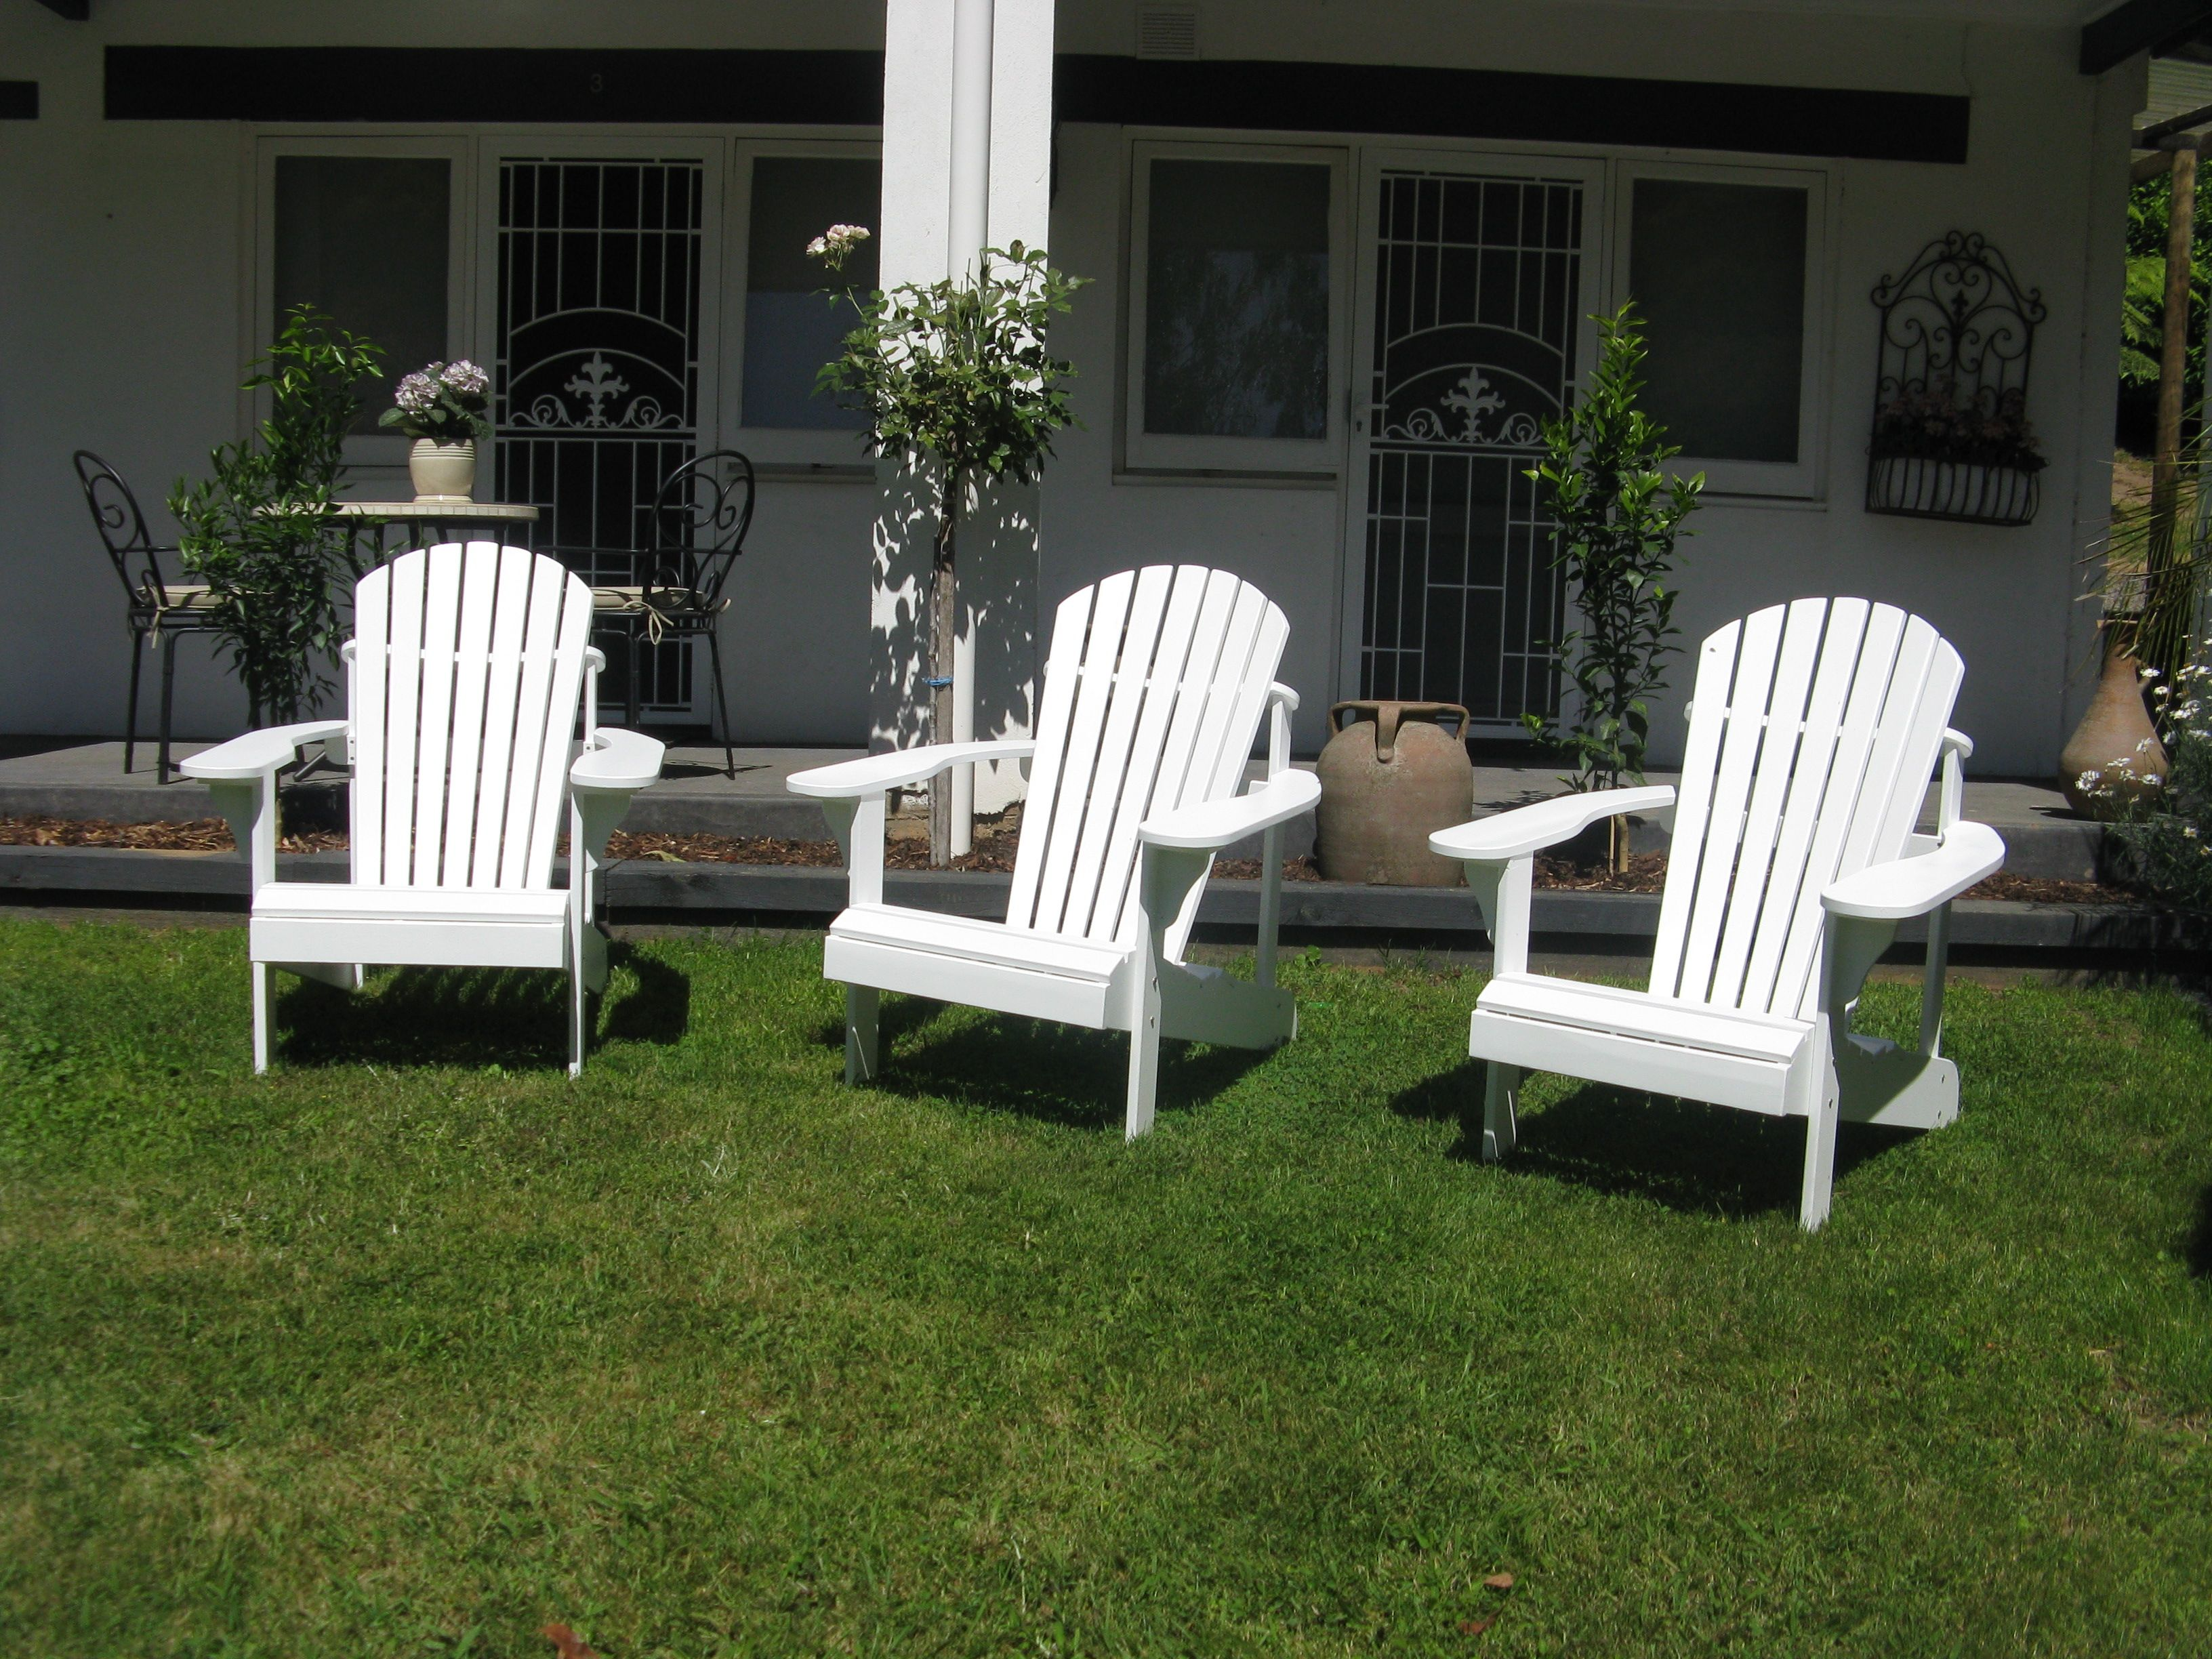 To Build: Adirondack / Cape Cod chairs | Make it! | Pinterest | Cod ...